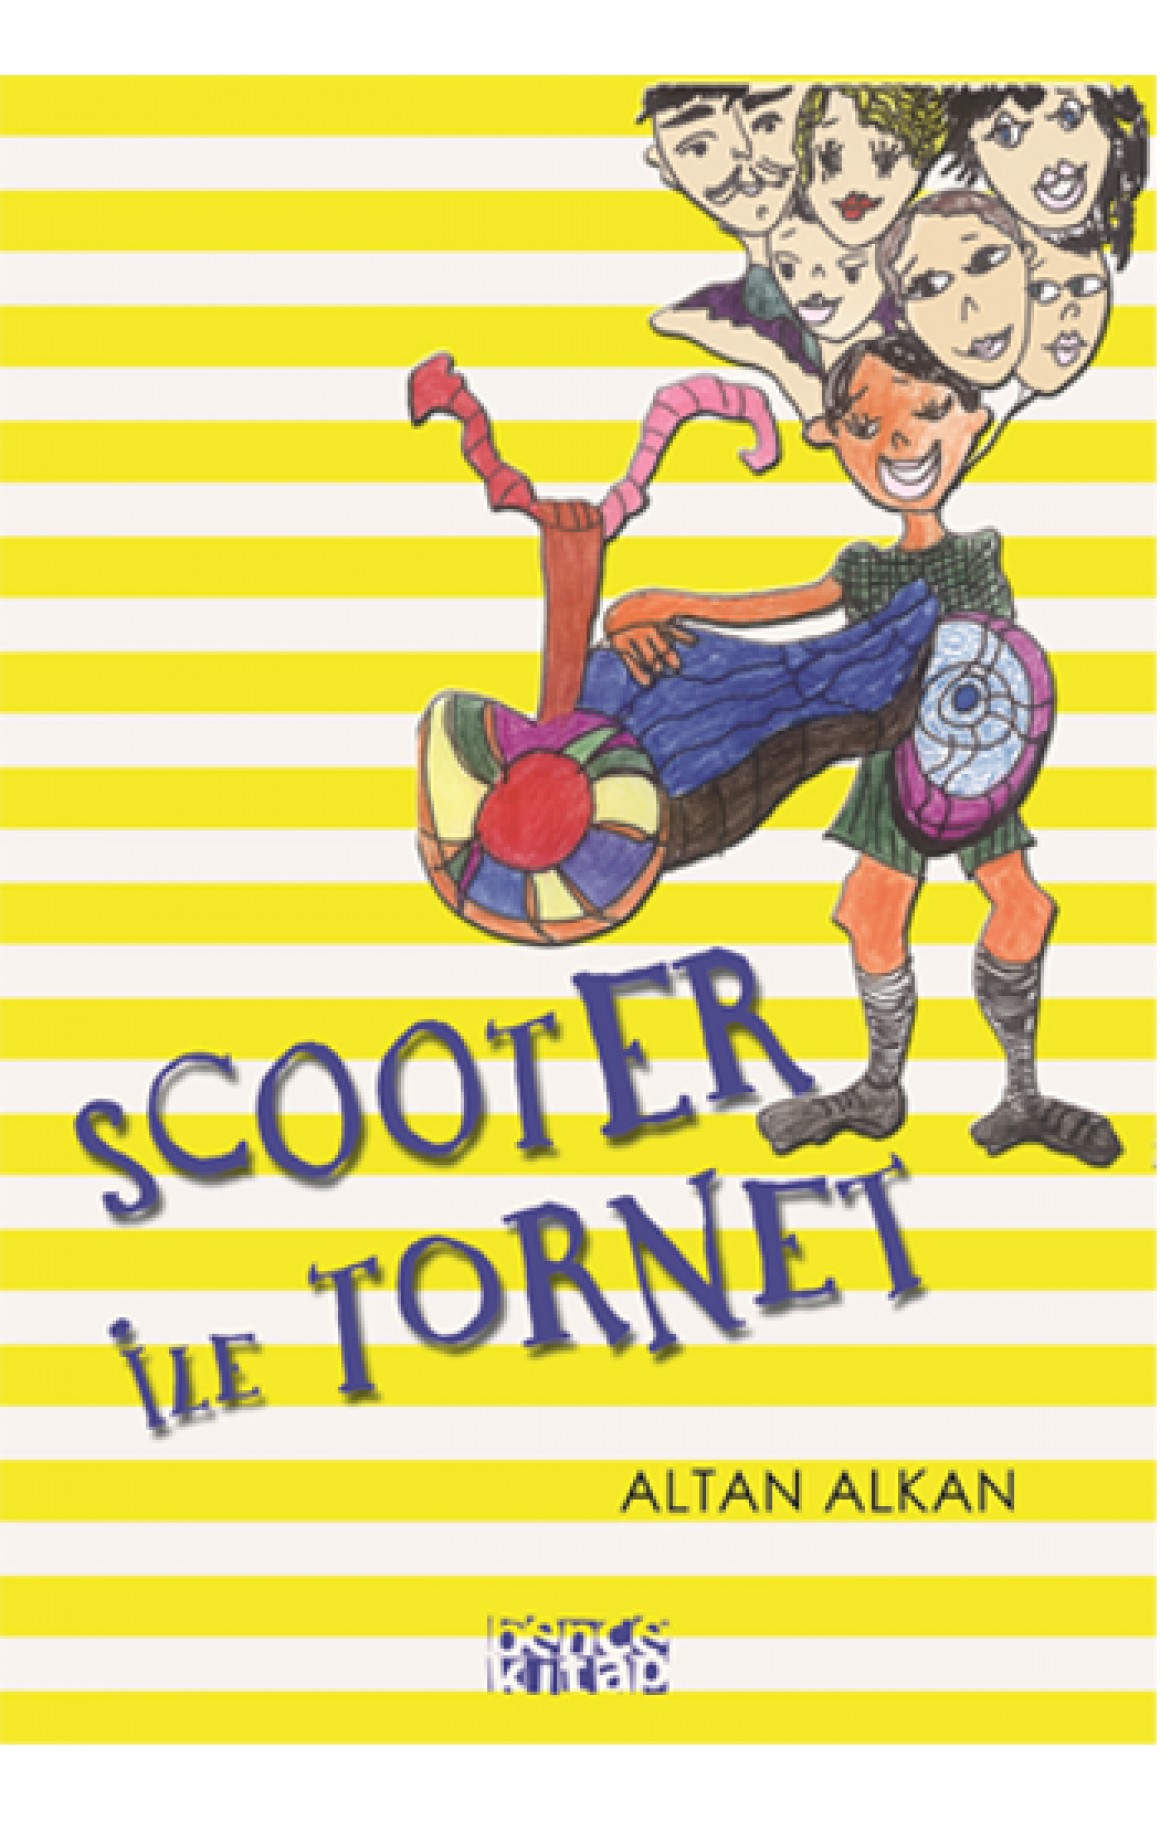 Scooter ile Tornet